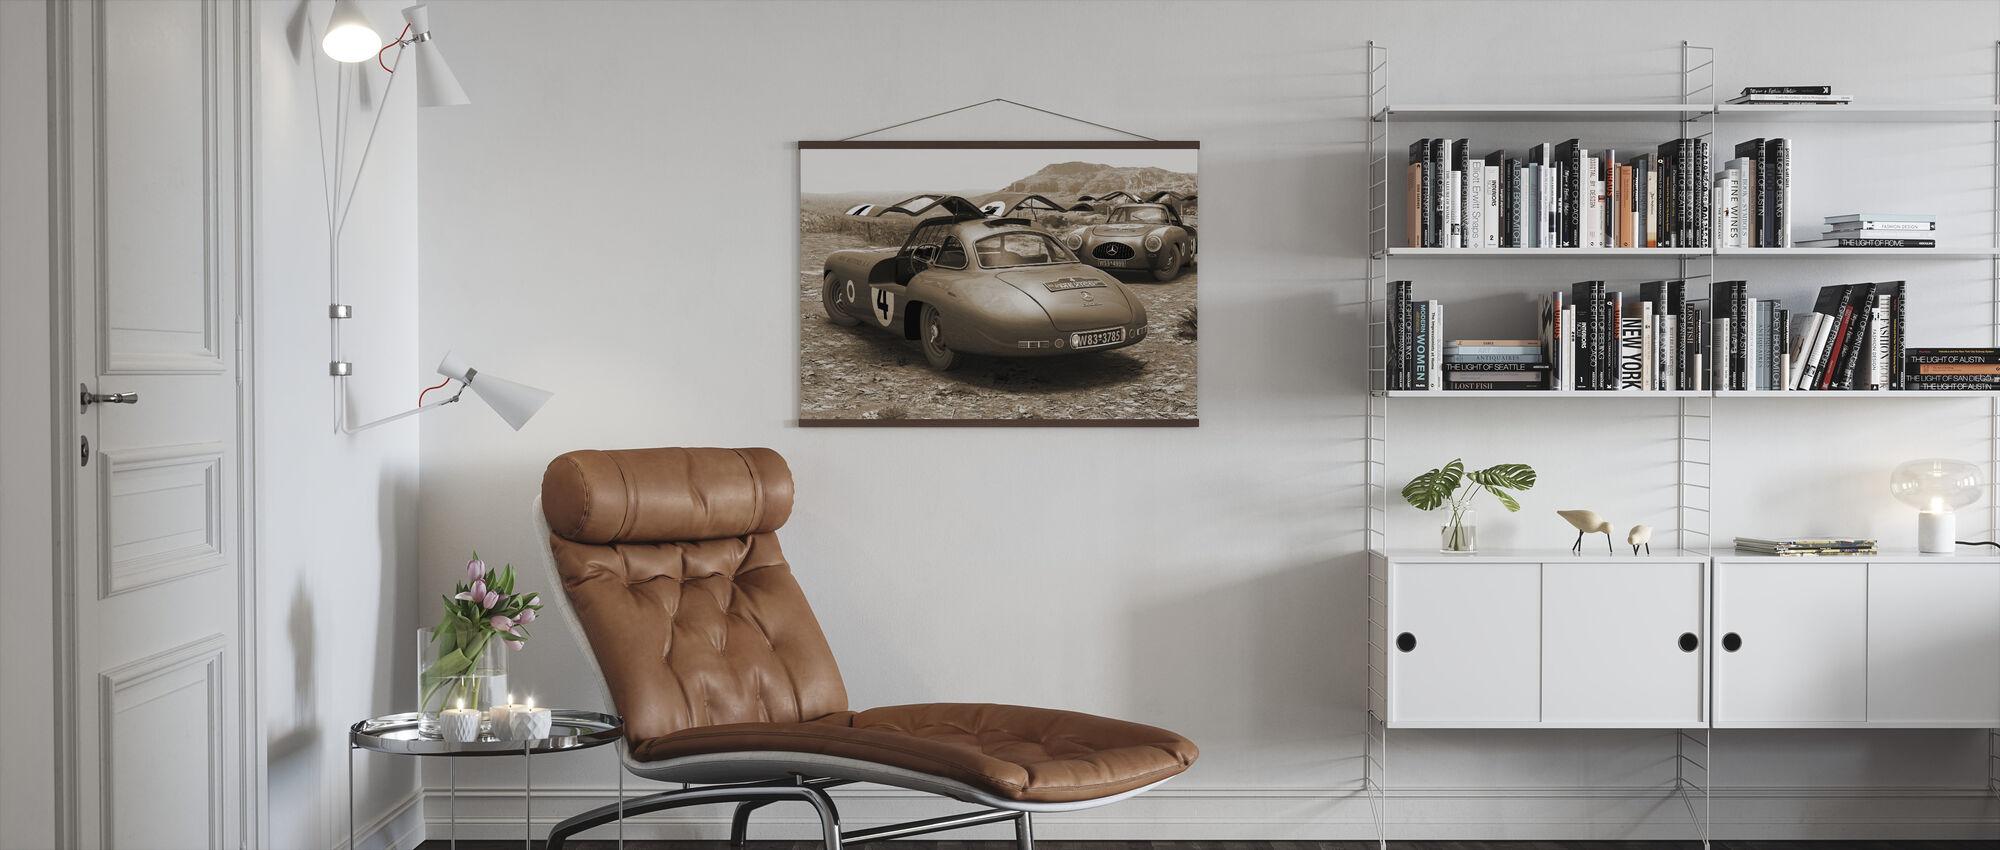 Mexico Sepia - Poster - Living Room